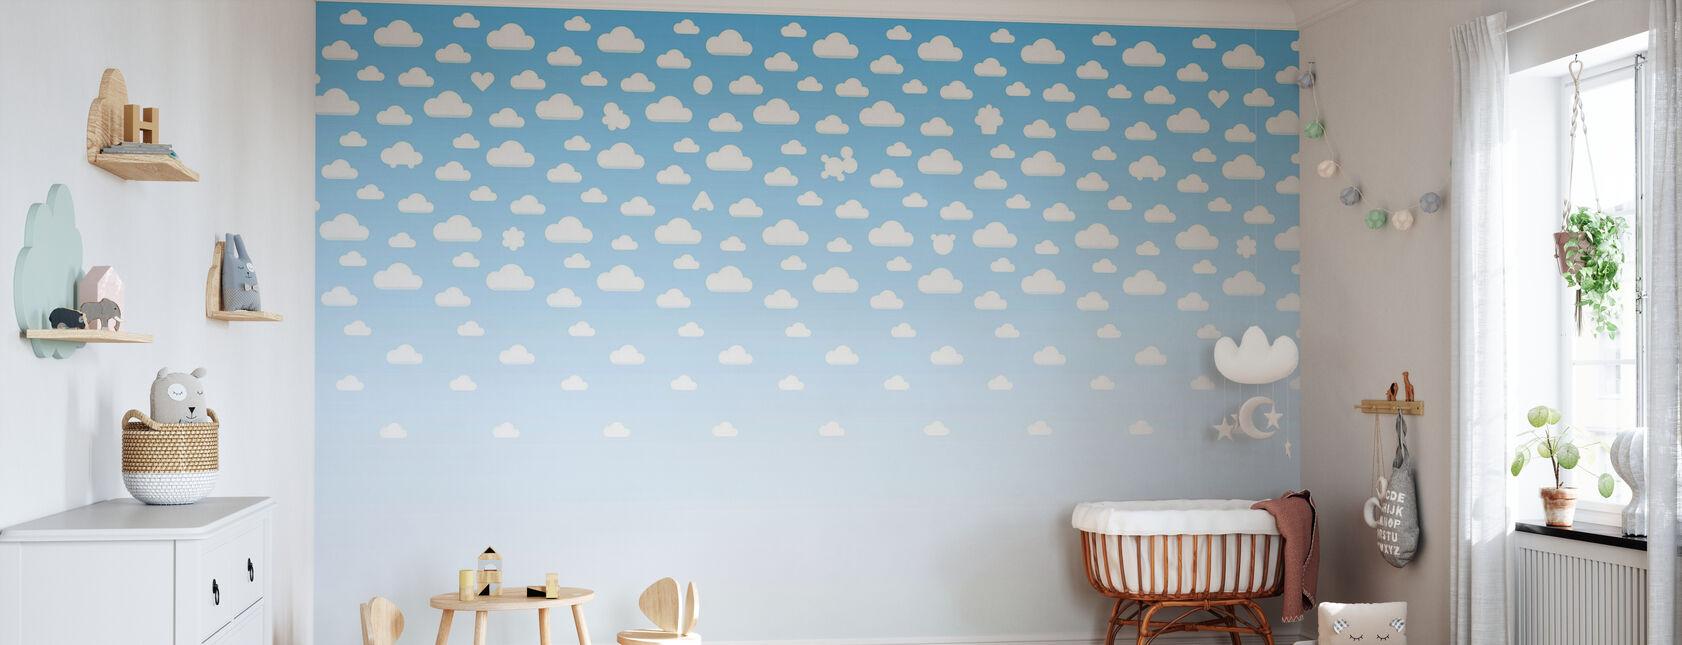 Cloudspotting Blå - Tapet - Babyrom